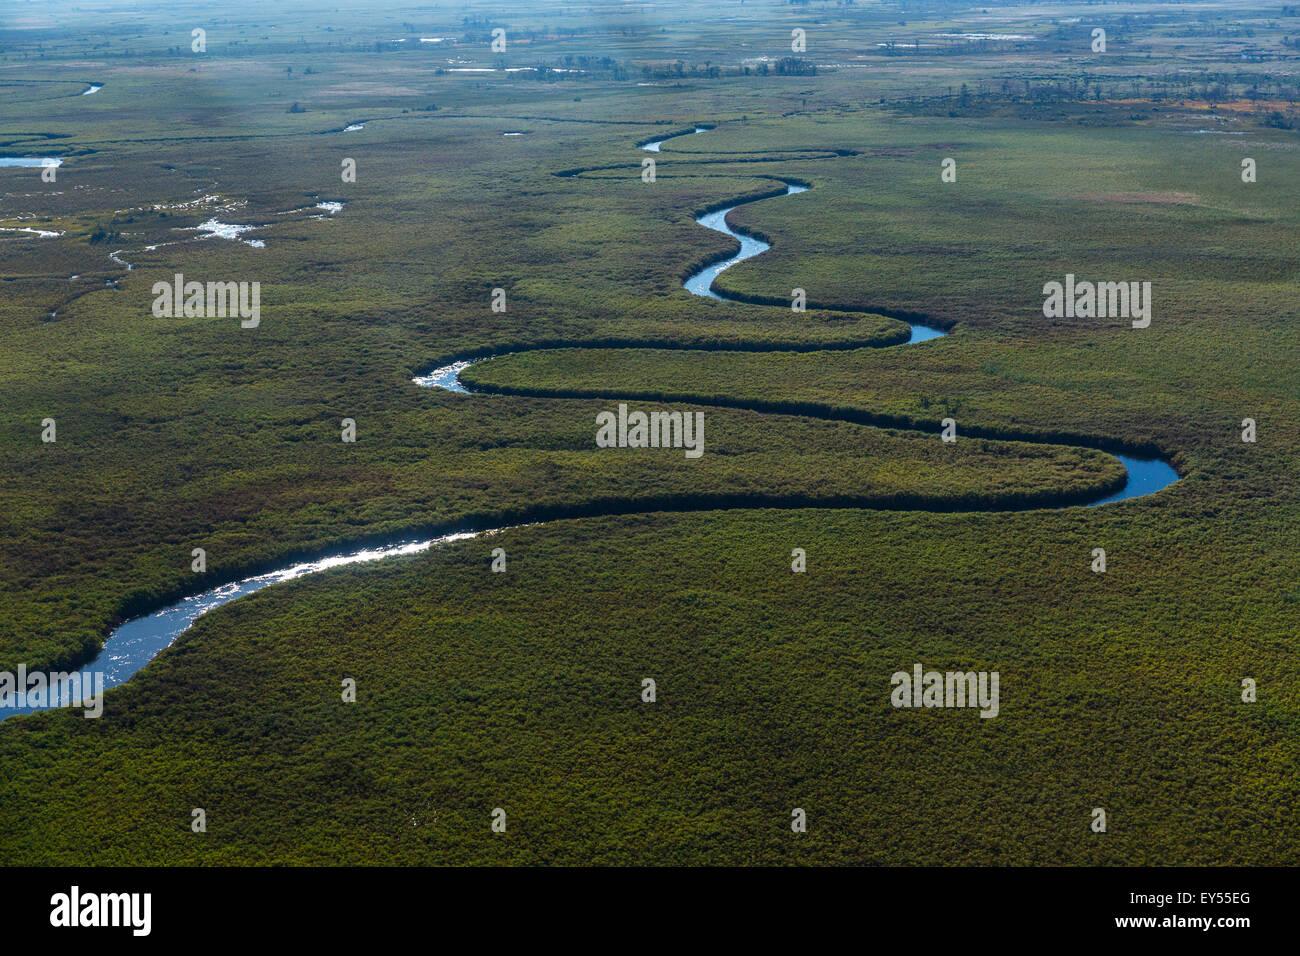 Aerial view of the Okavango Delta - Botswana - Stock Image